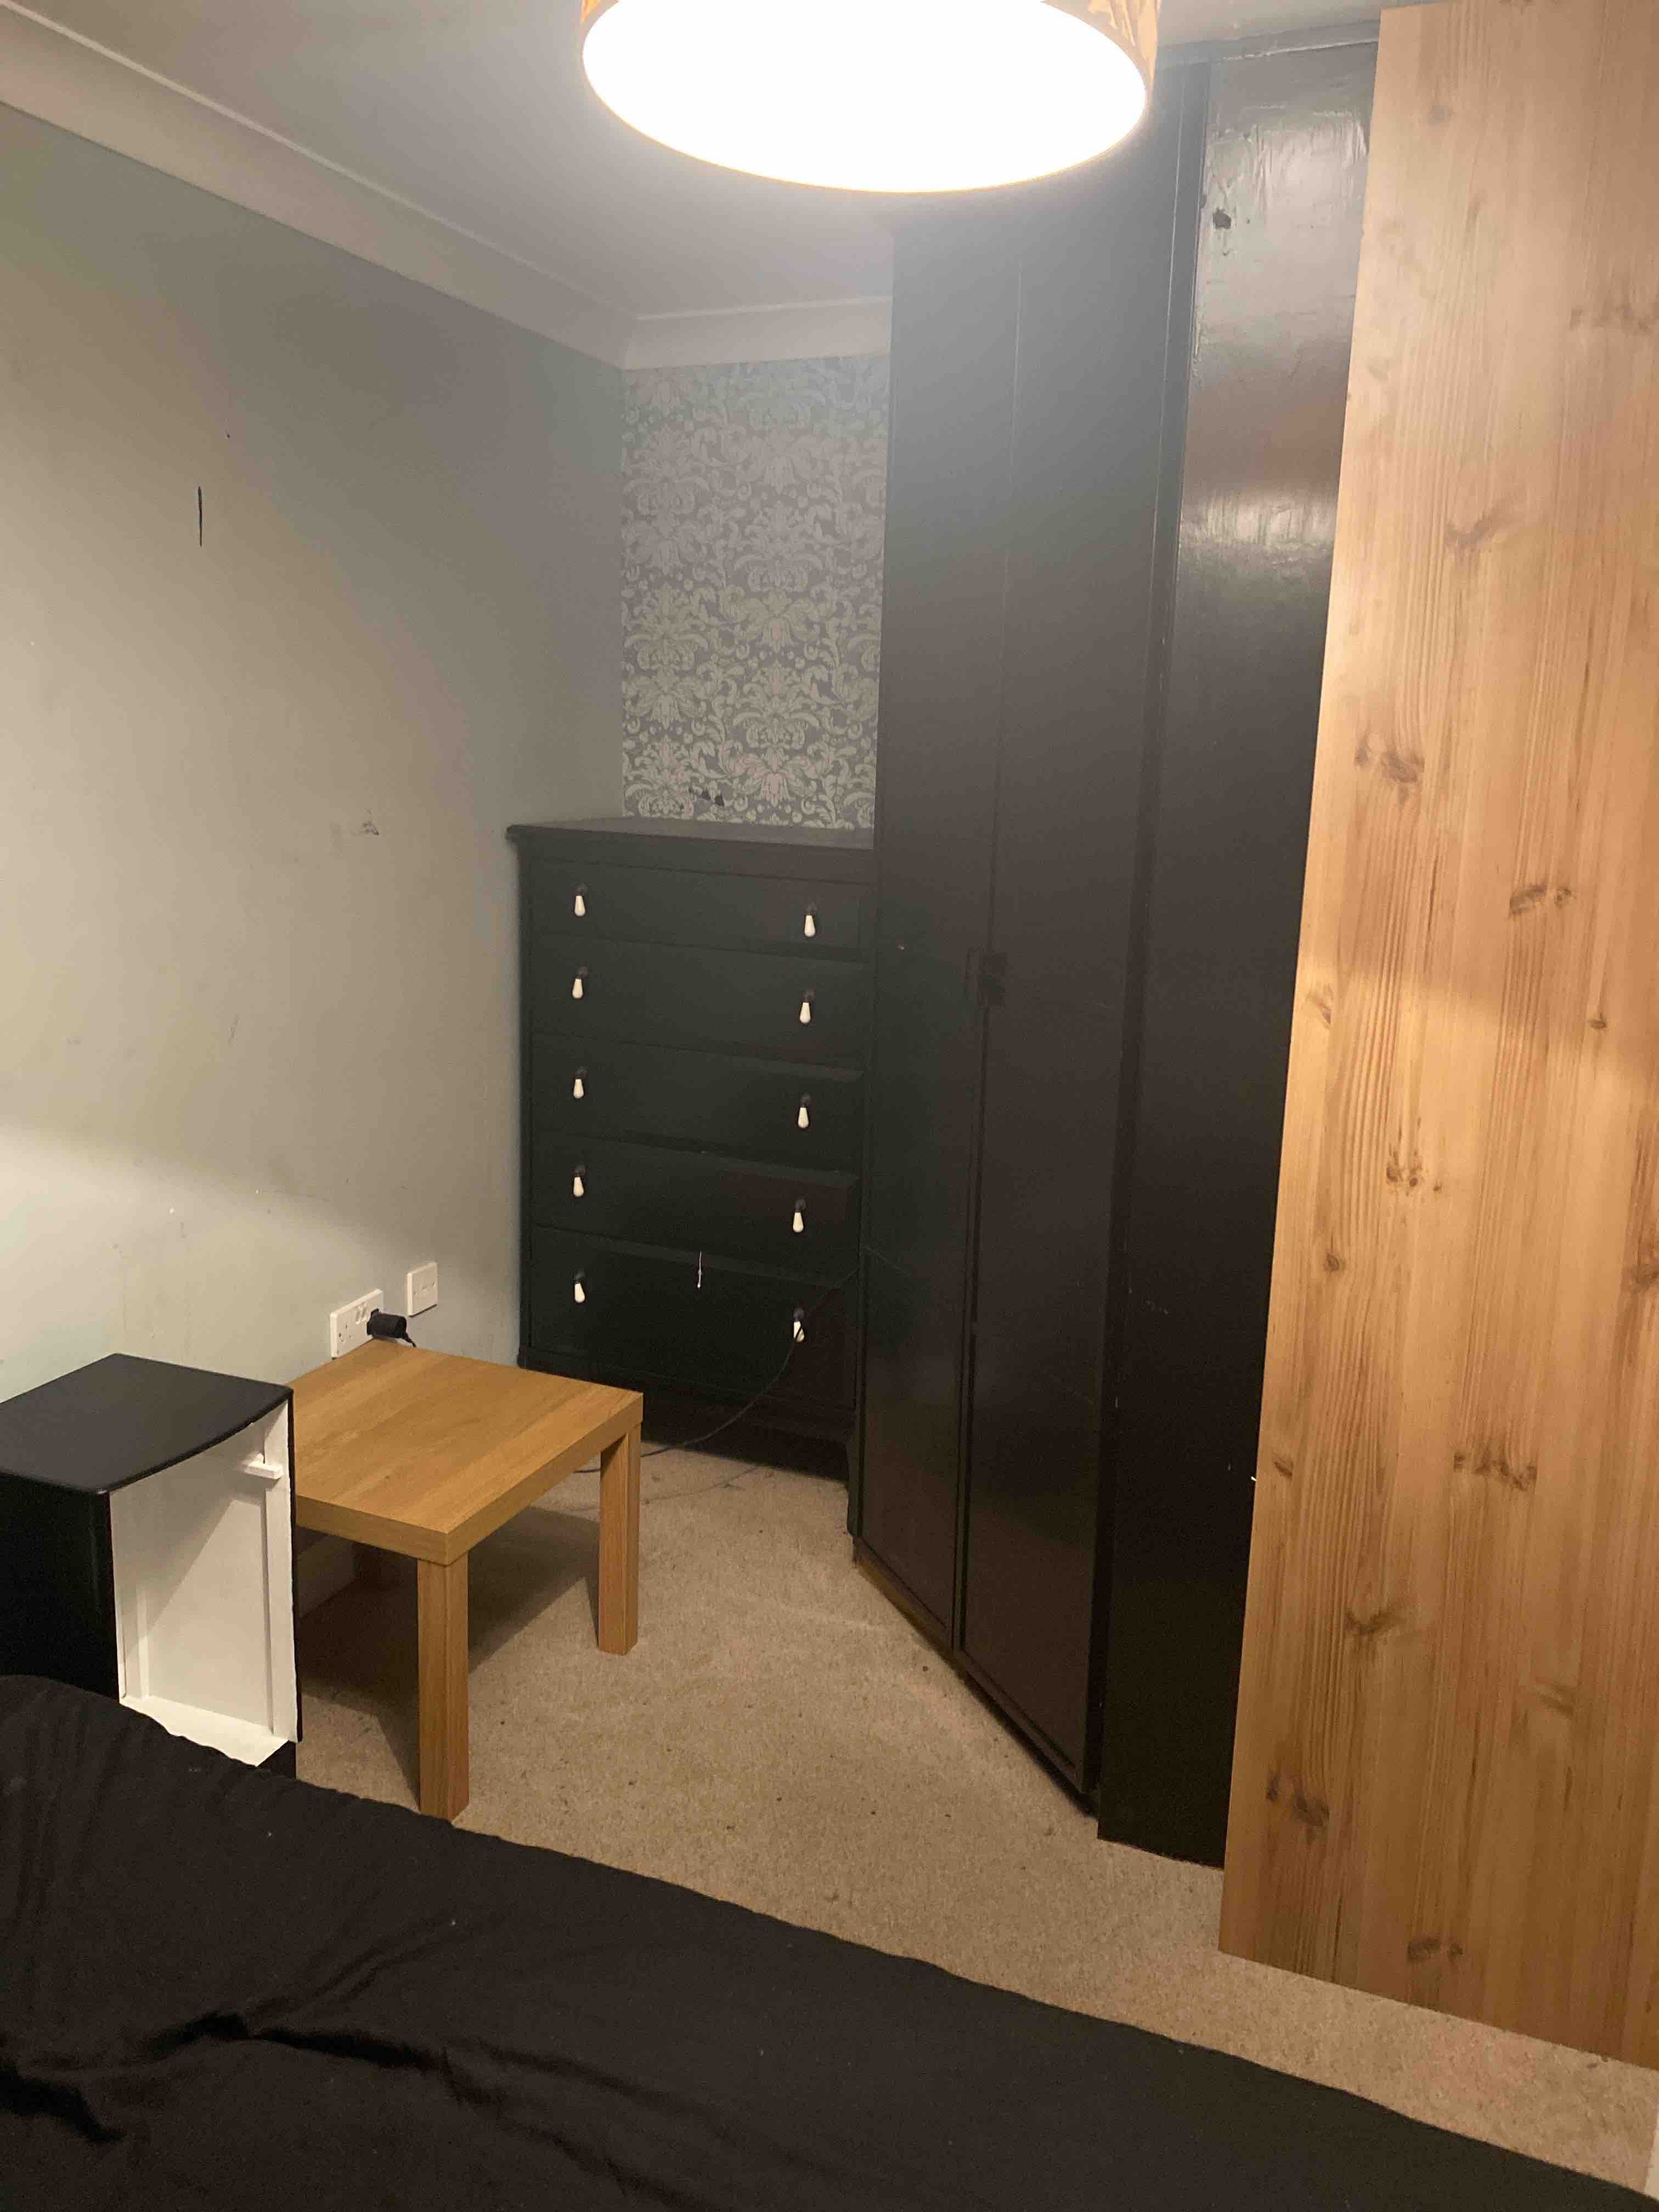 1 room in Woolstone, Milton Keynes, MK10 9PF RoomsLocal image